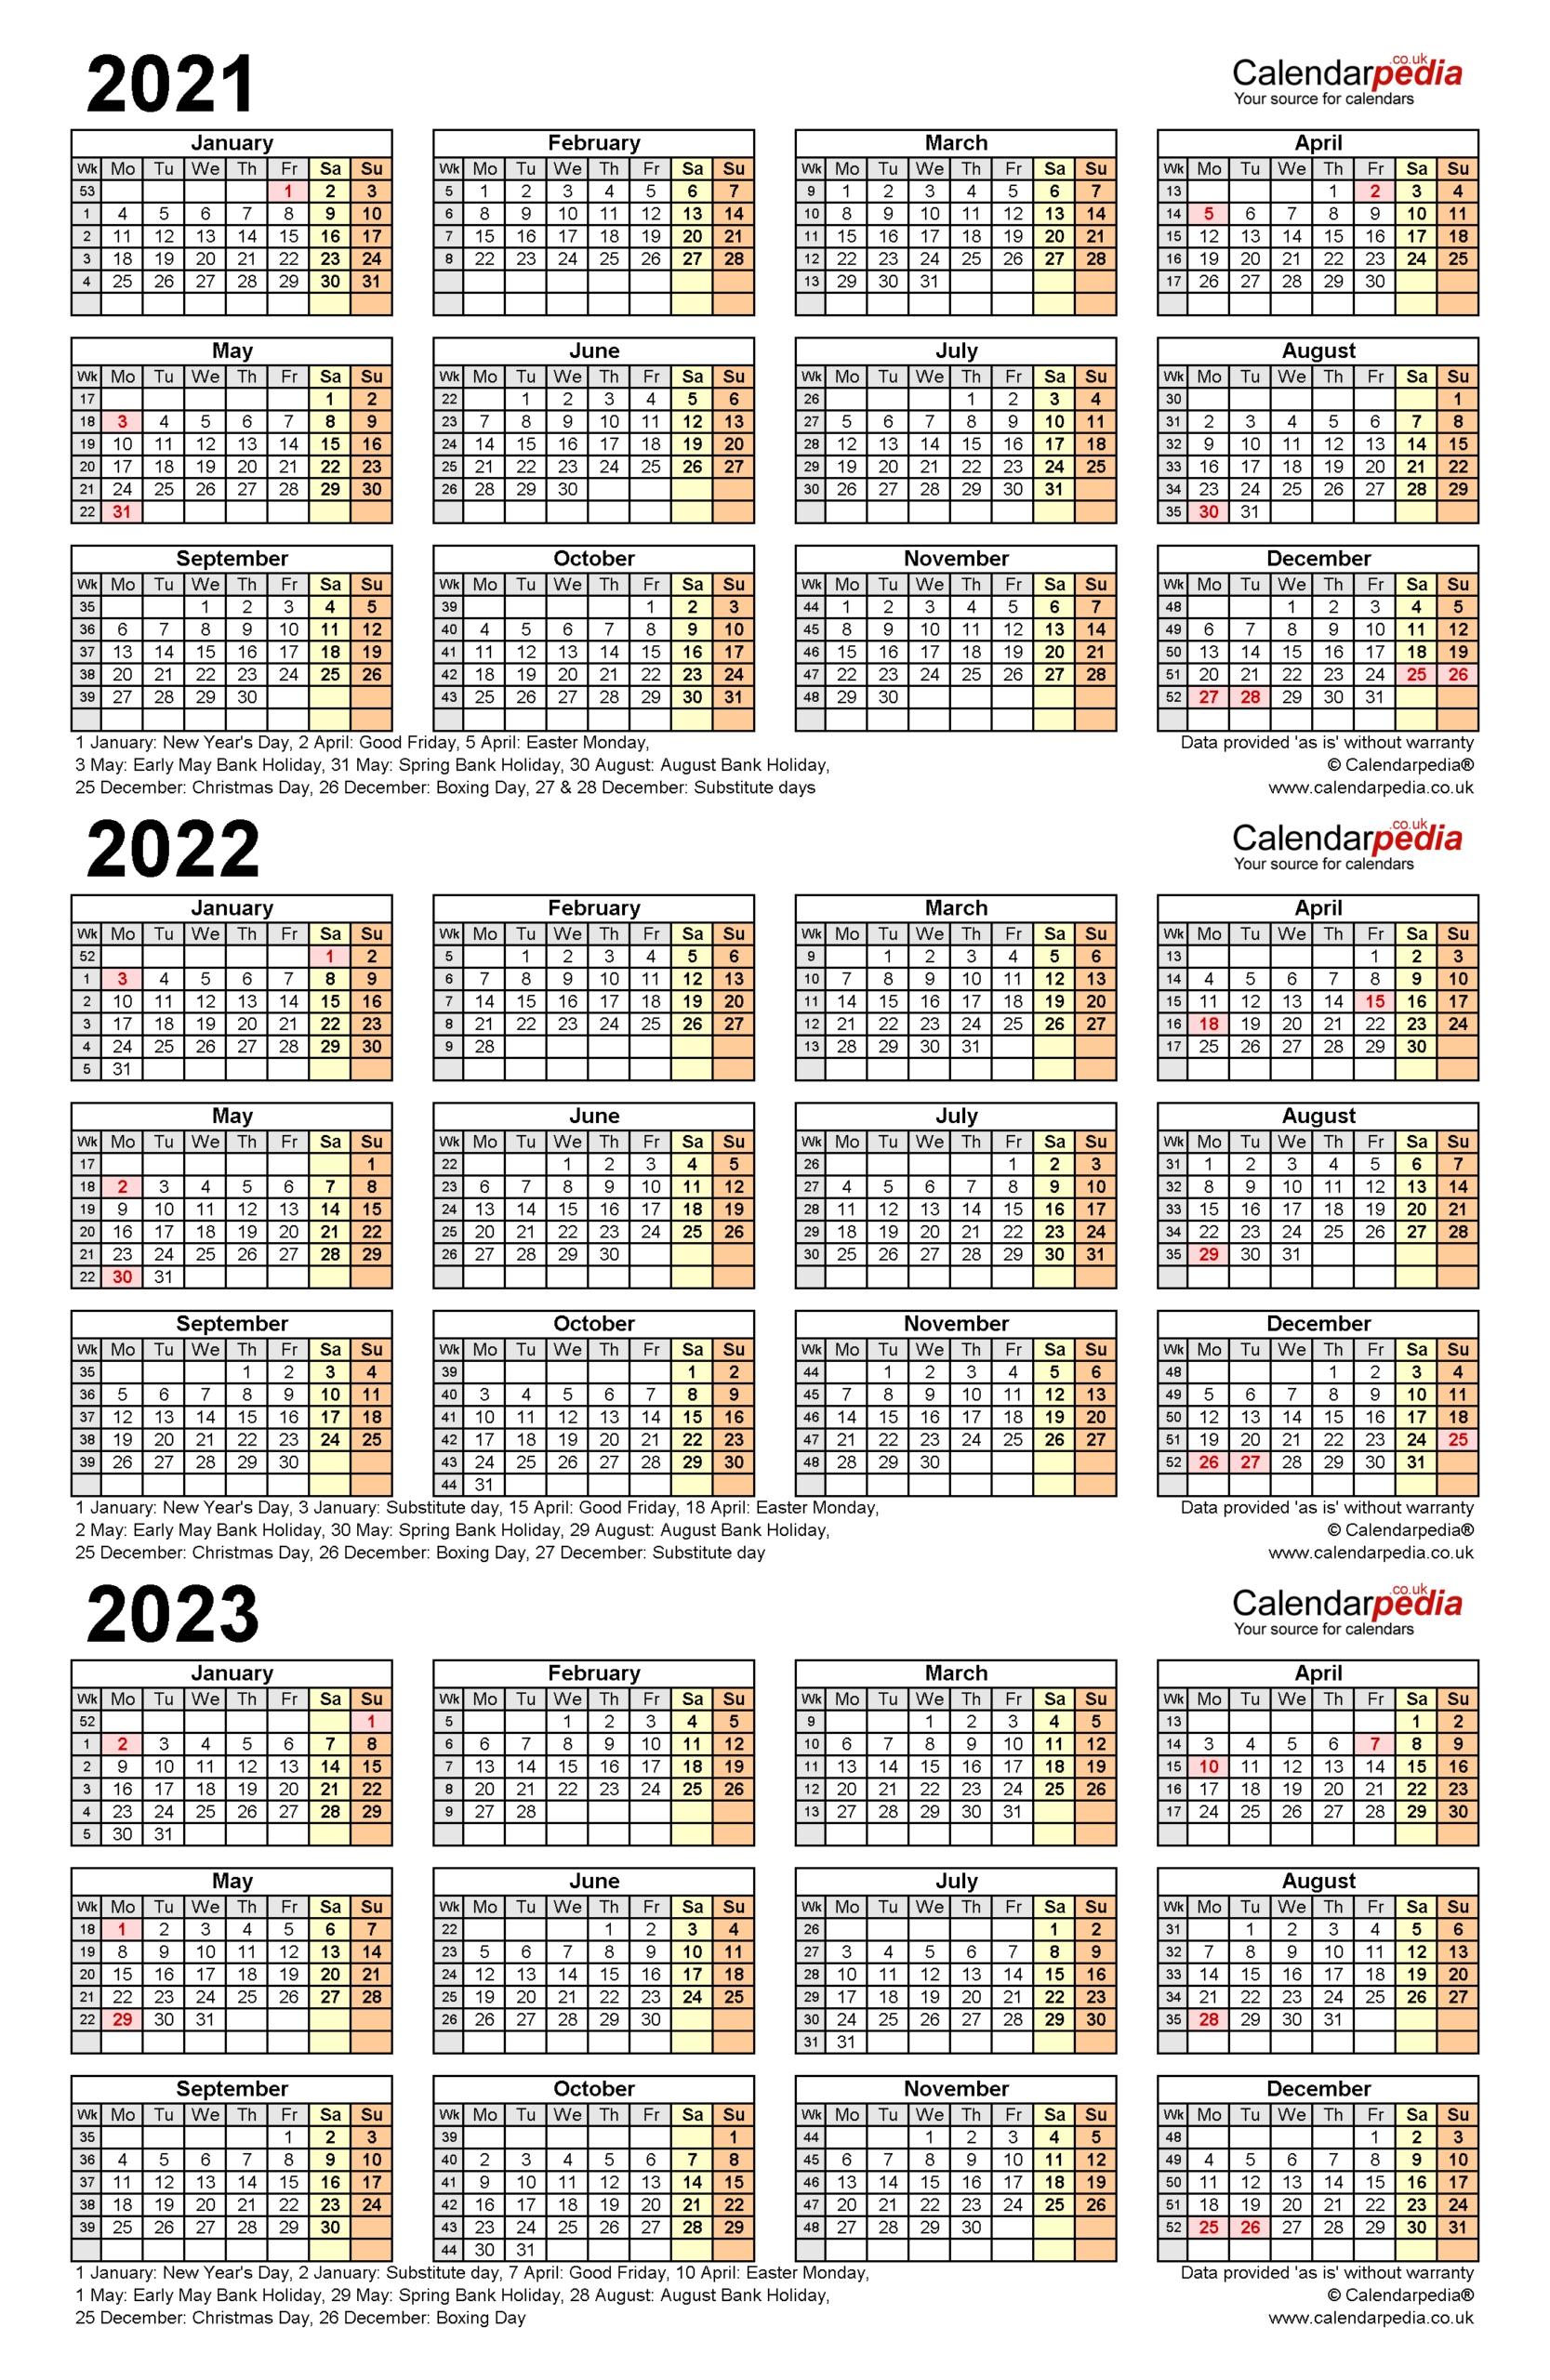 Three Year Printable Calendar 2021 To 2023 | Calendar Printables Free Blank regarding Calender 2021 To 2025 Photo